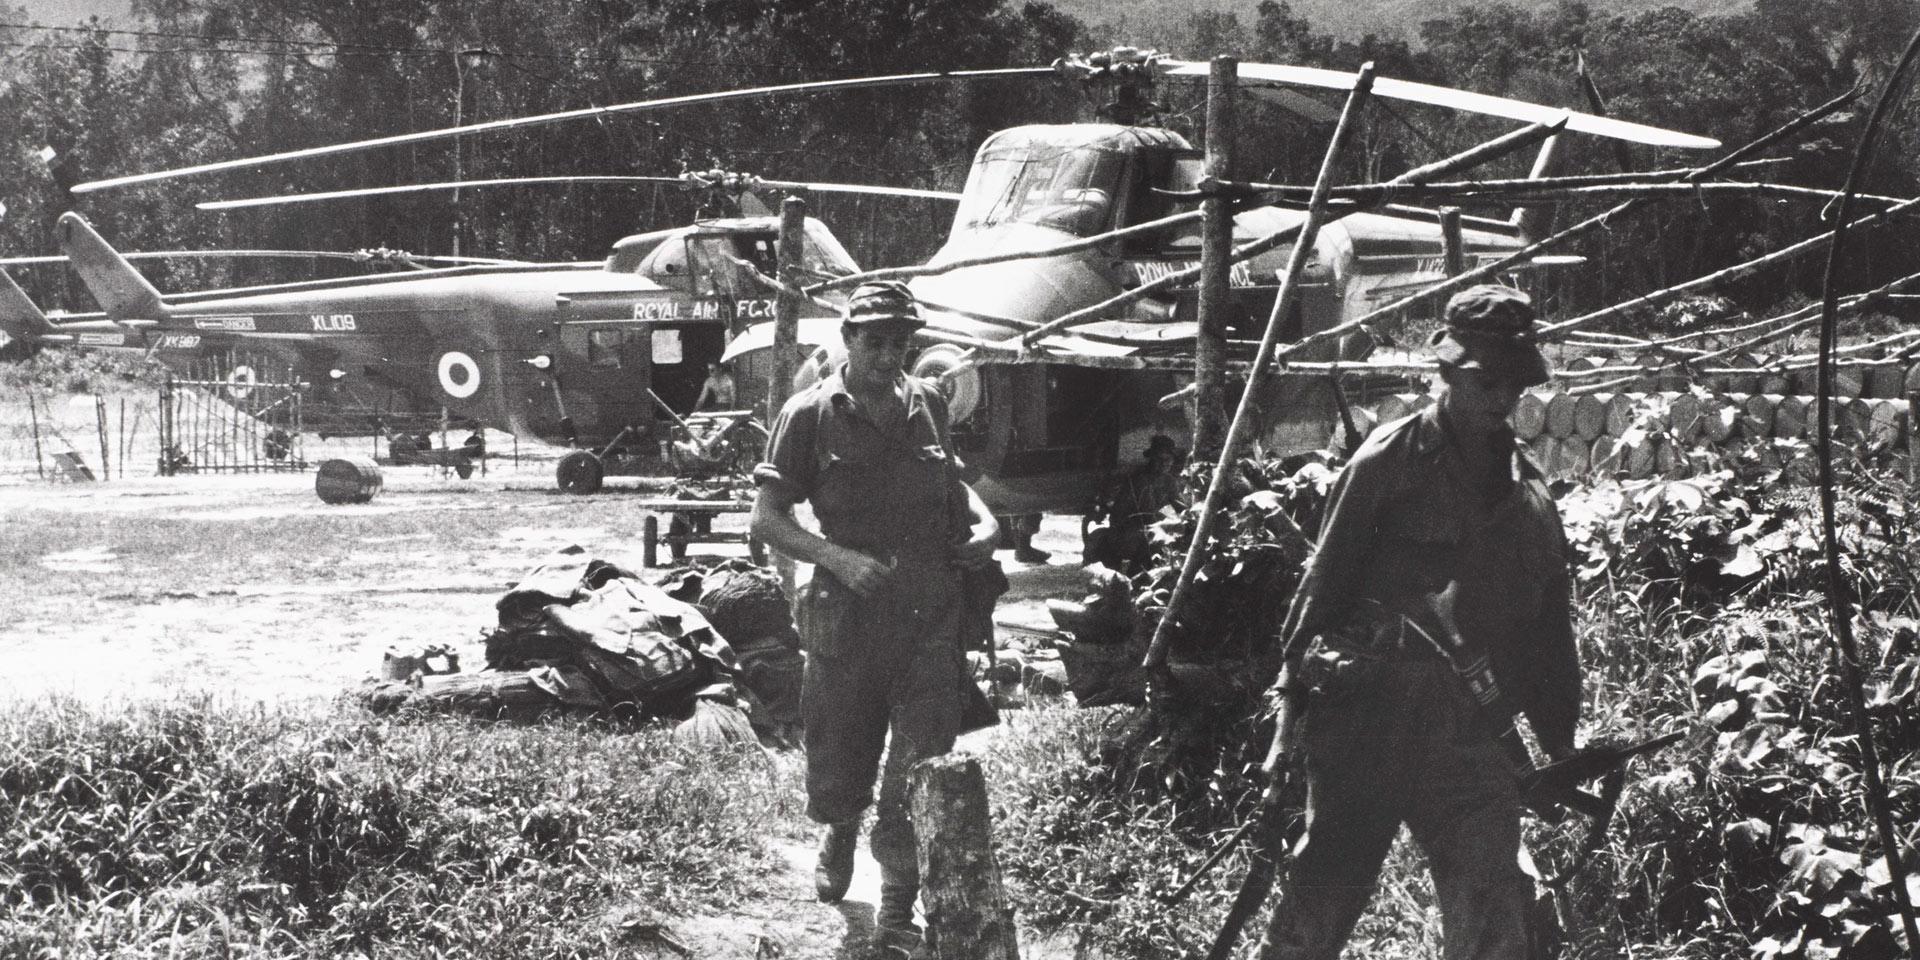 Nanga Gaat, an SAS forward base on the Rejang River, North Borneo, 1964